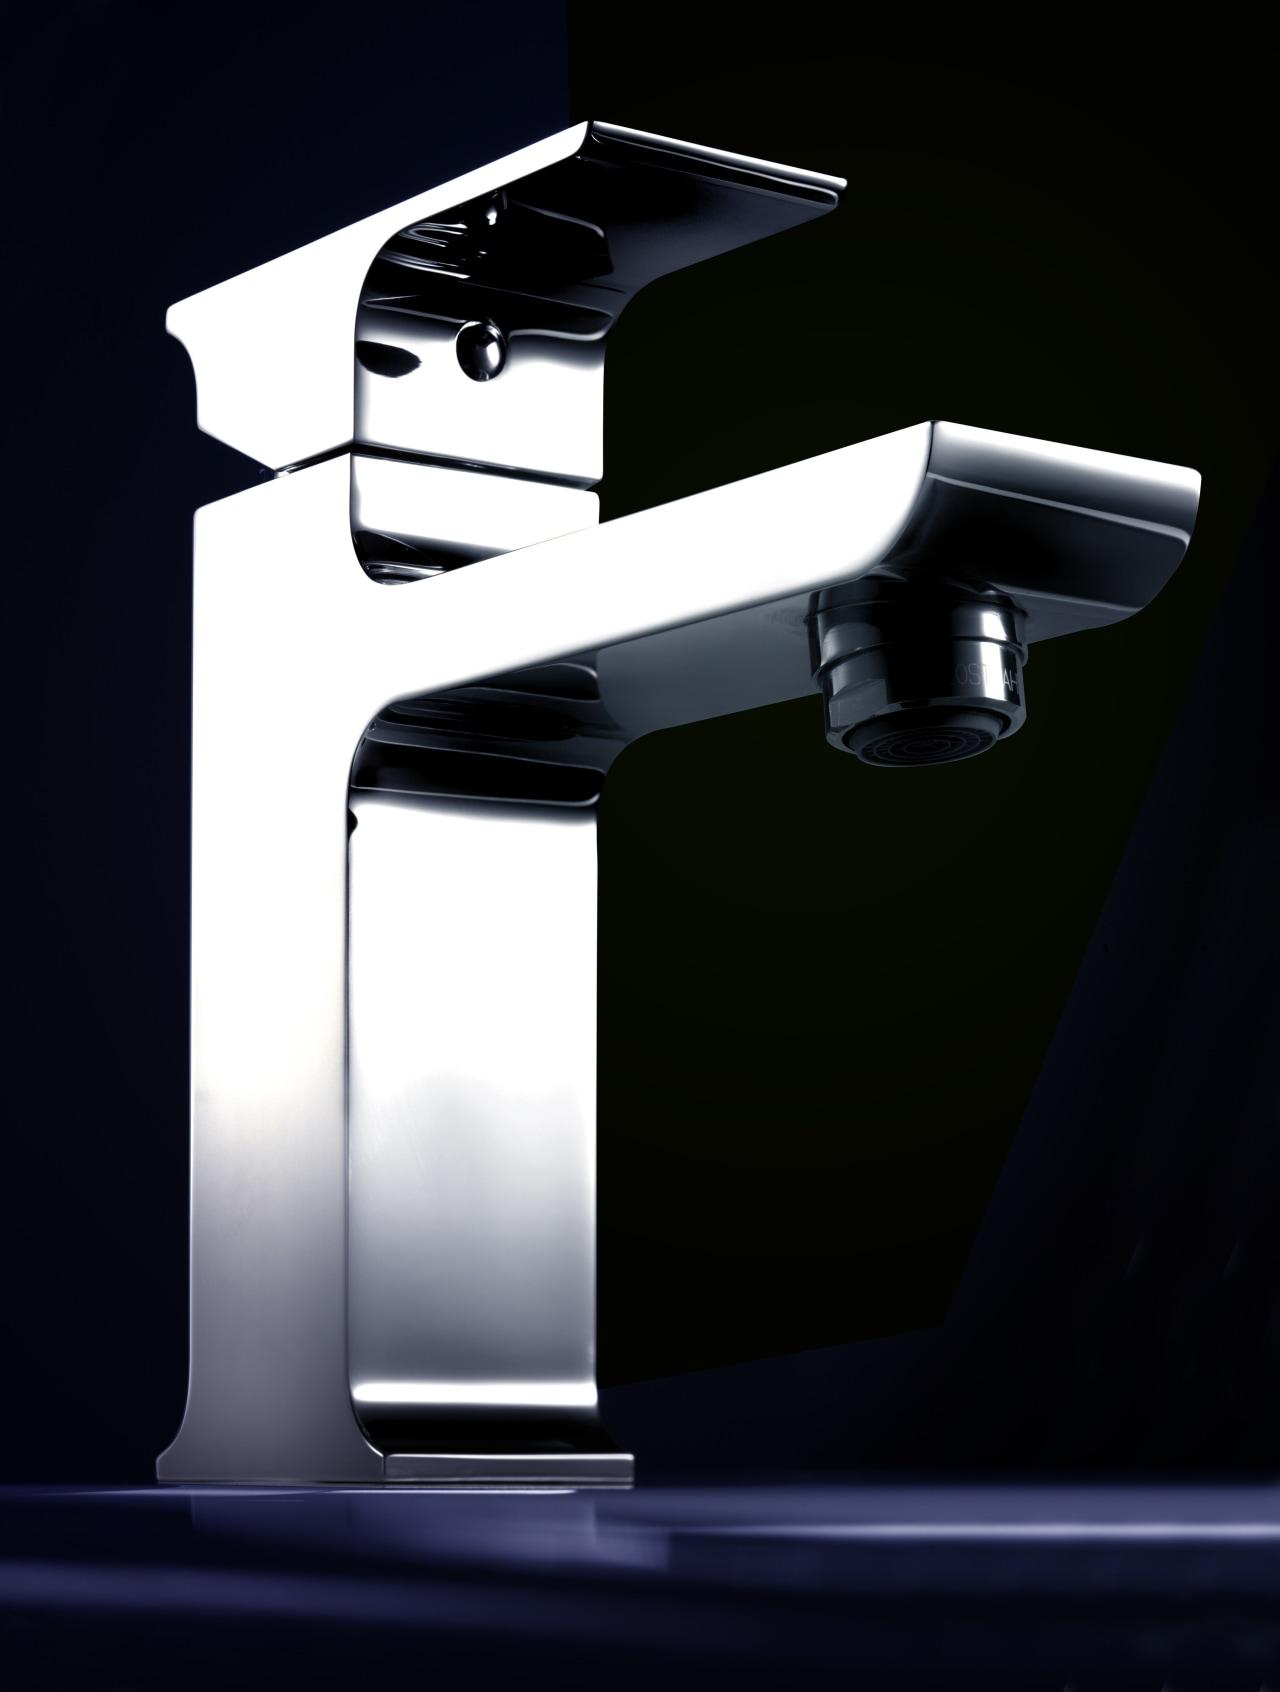 Dorf Jovian basin mixer eco-friendly  bathroom fixture angle, hardware, plumbing fixture, product, product design, tap, black